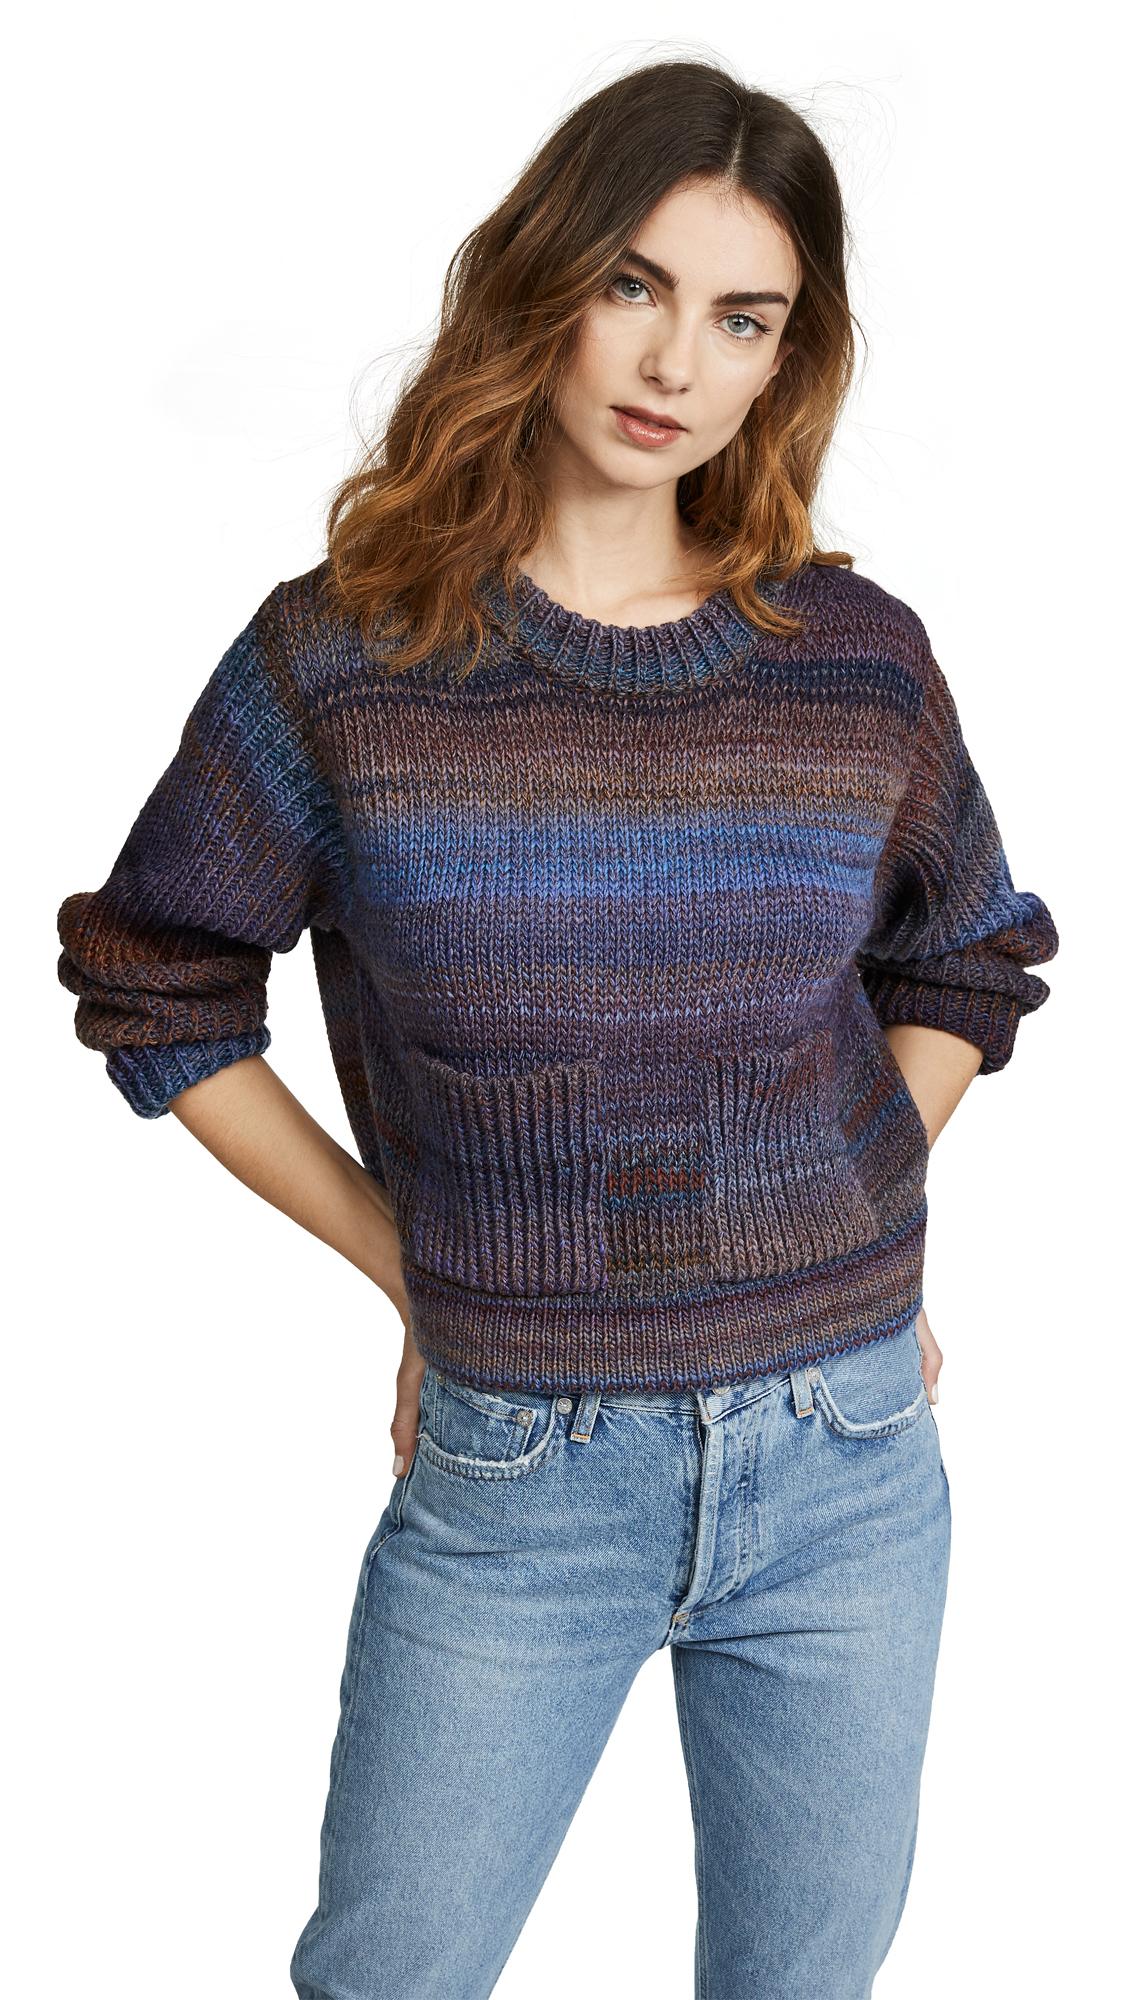 Acne Studios Kalisa Sweater - Rust/Blue